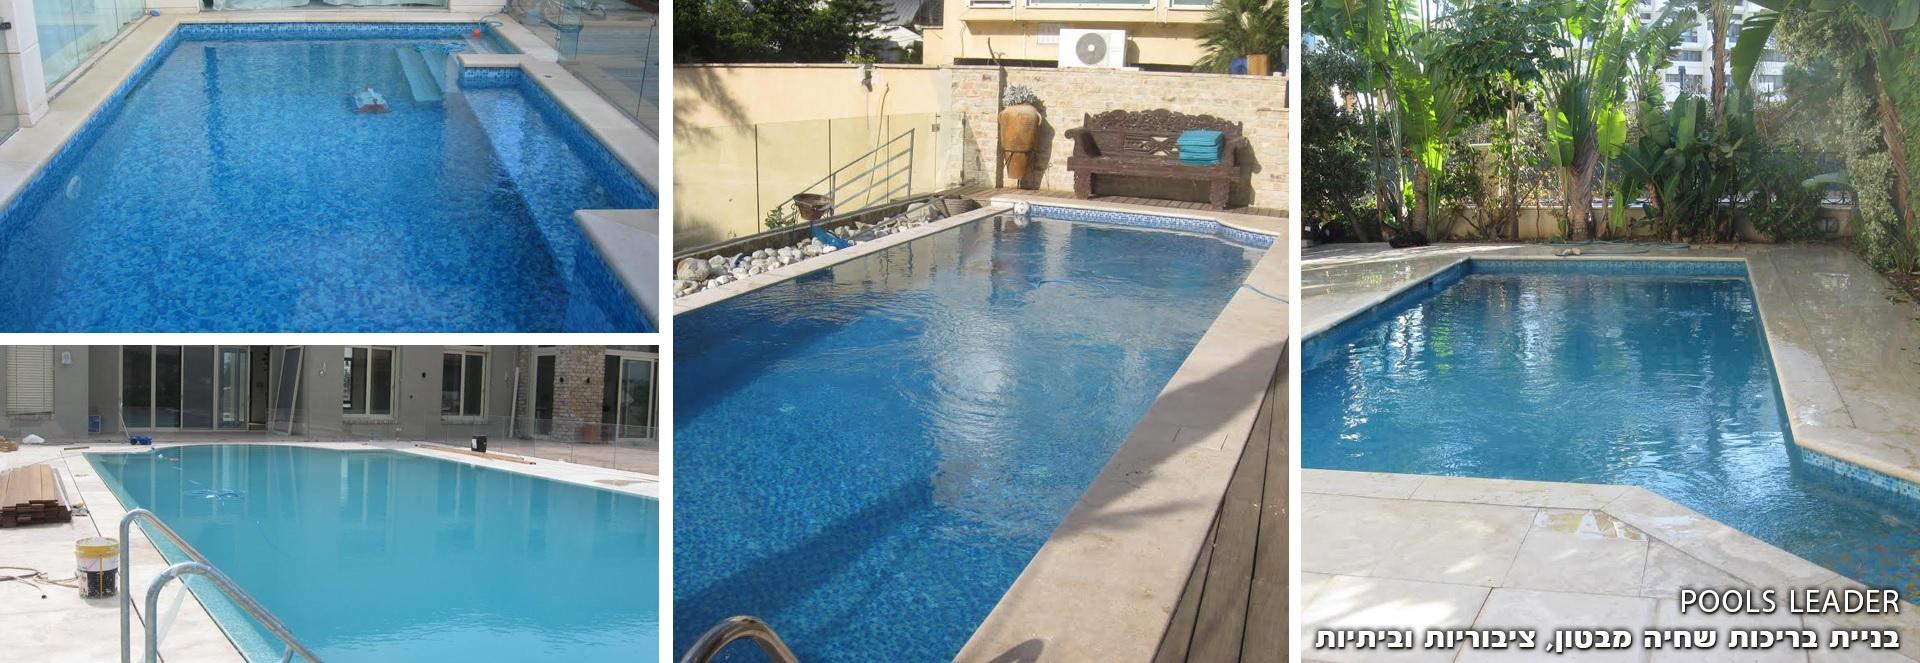 pools leader בניית בריכות שחייה מבטון